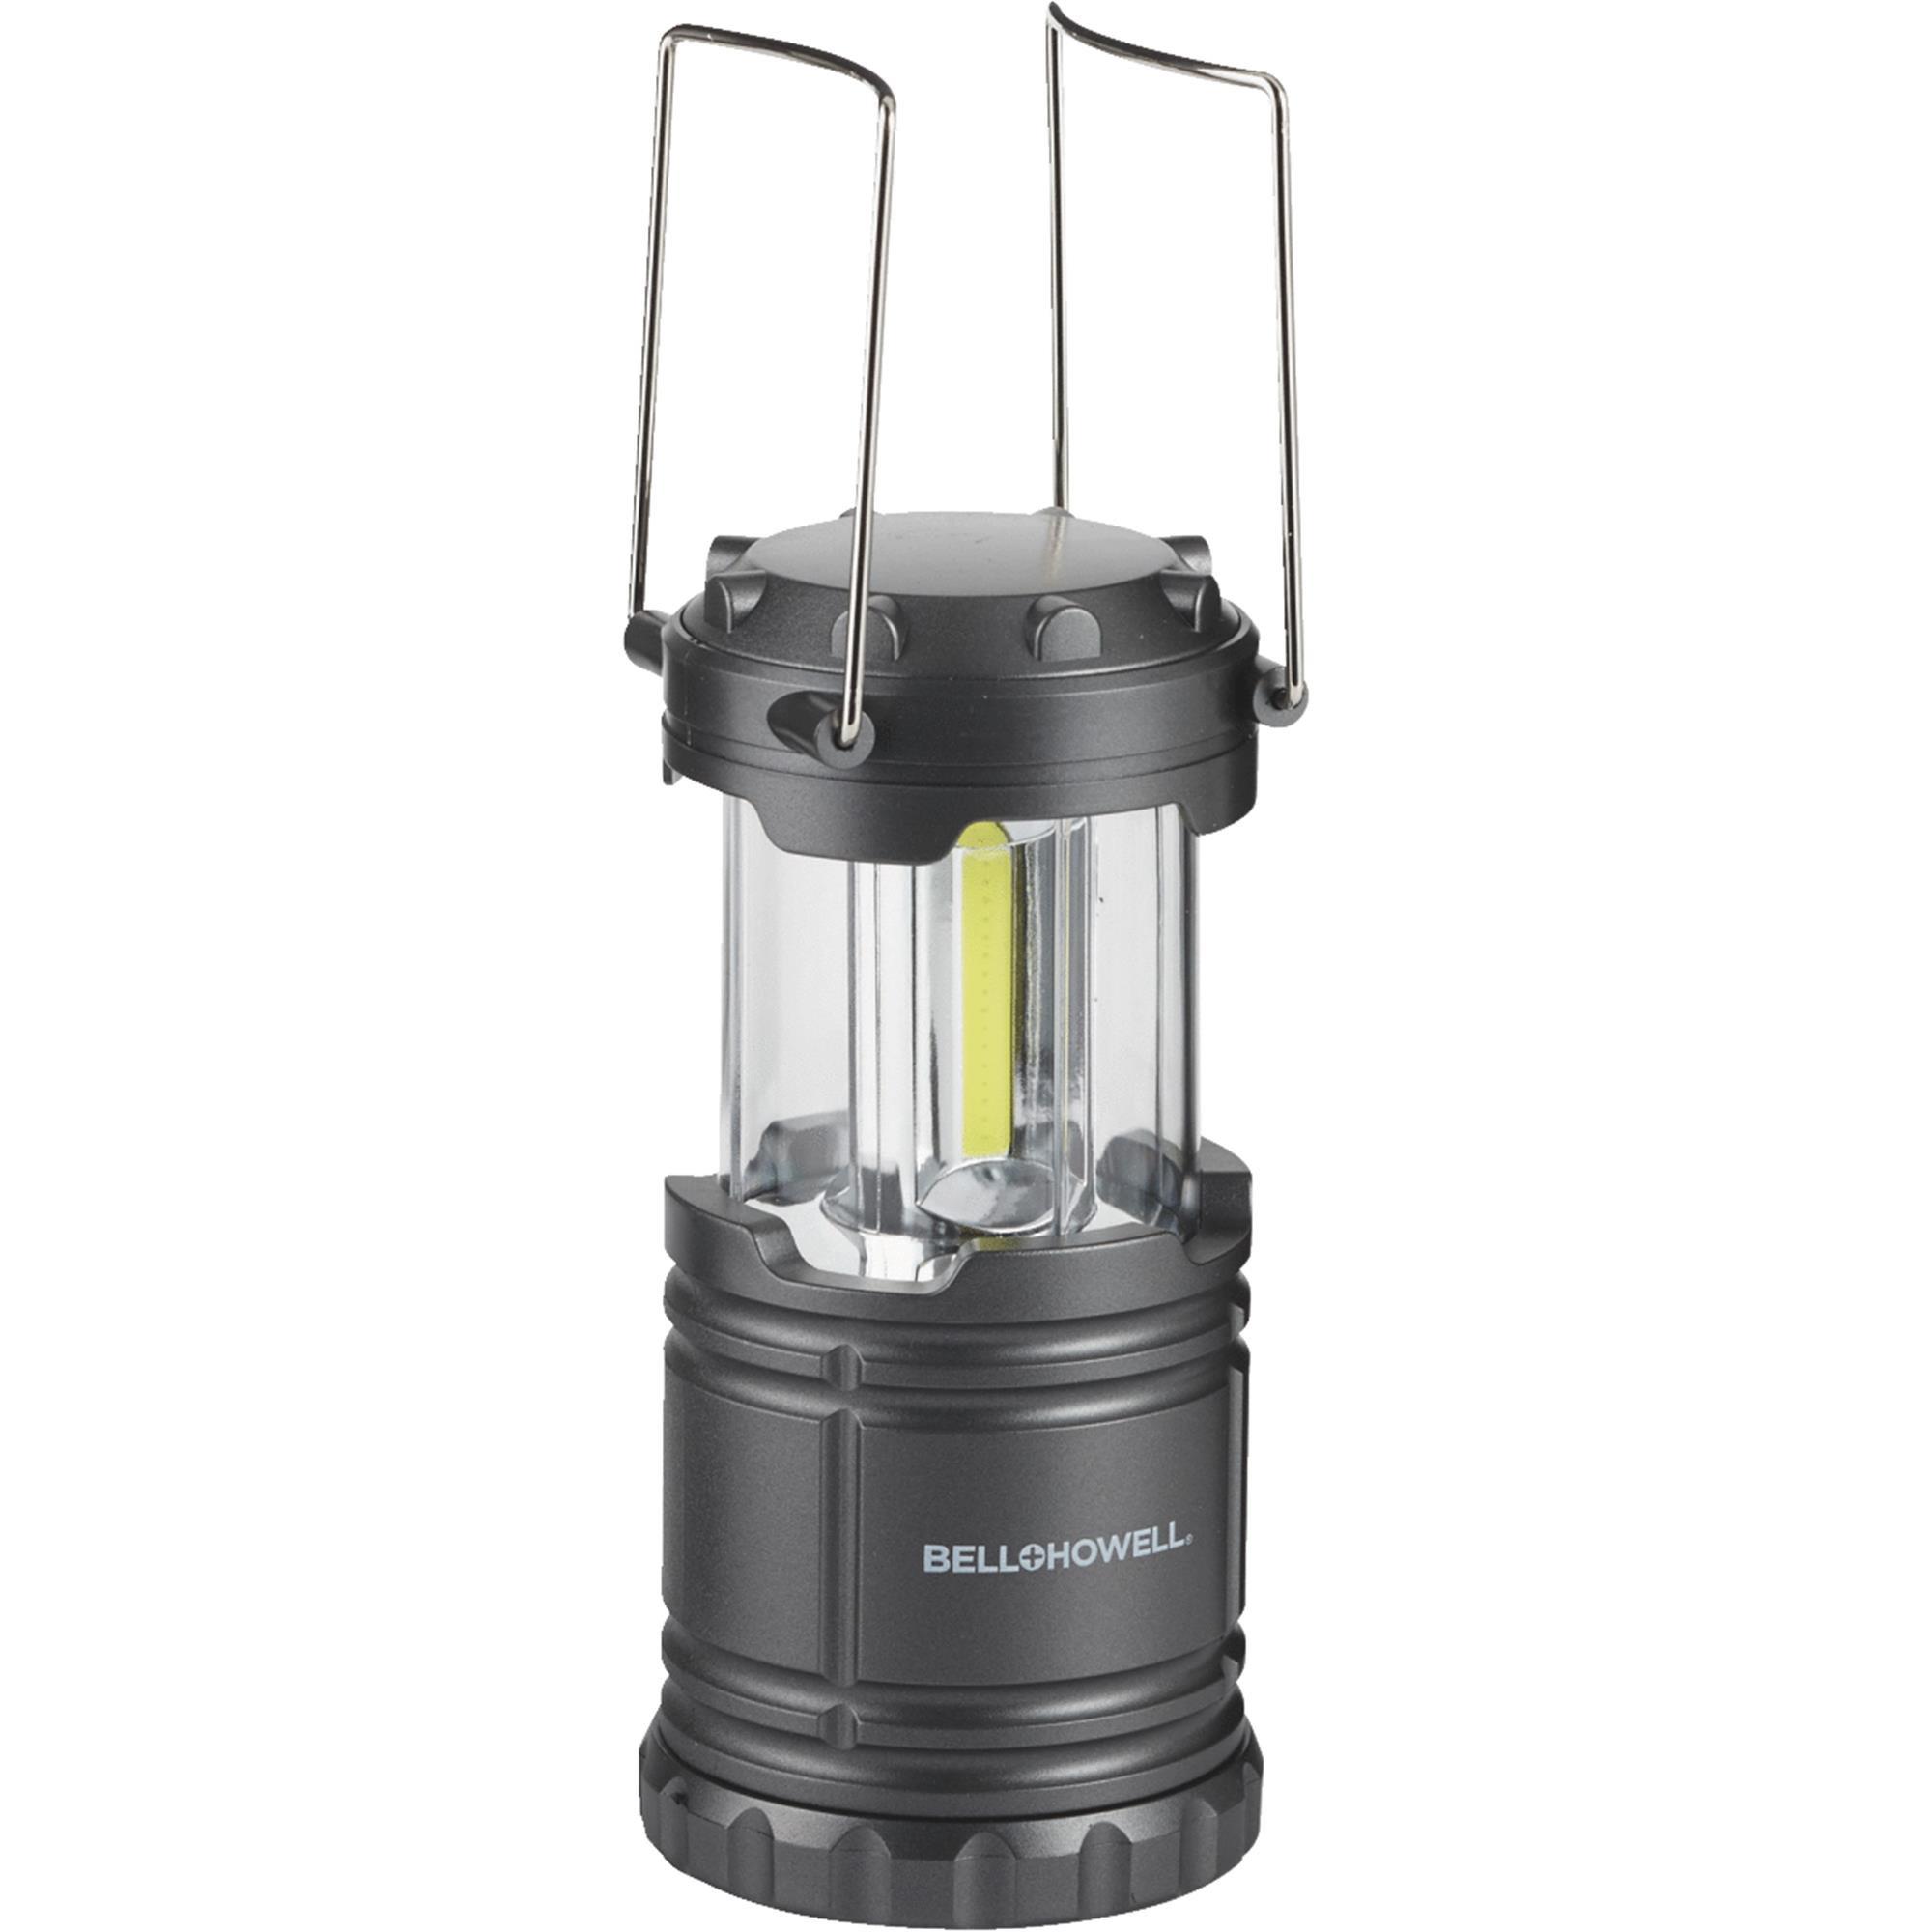 As Seen on TV Bell + Howell LED Taclight Lantern - Walmart.com